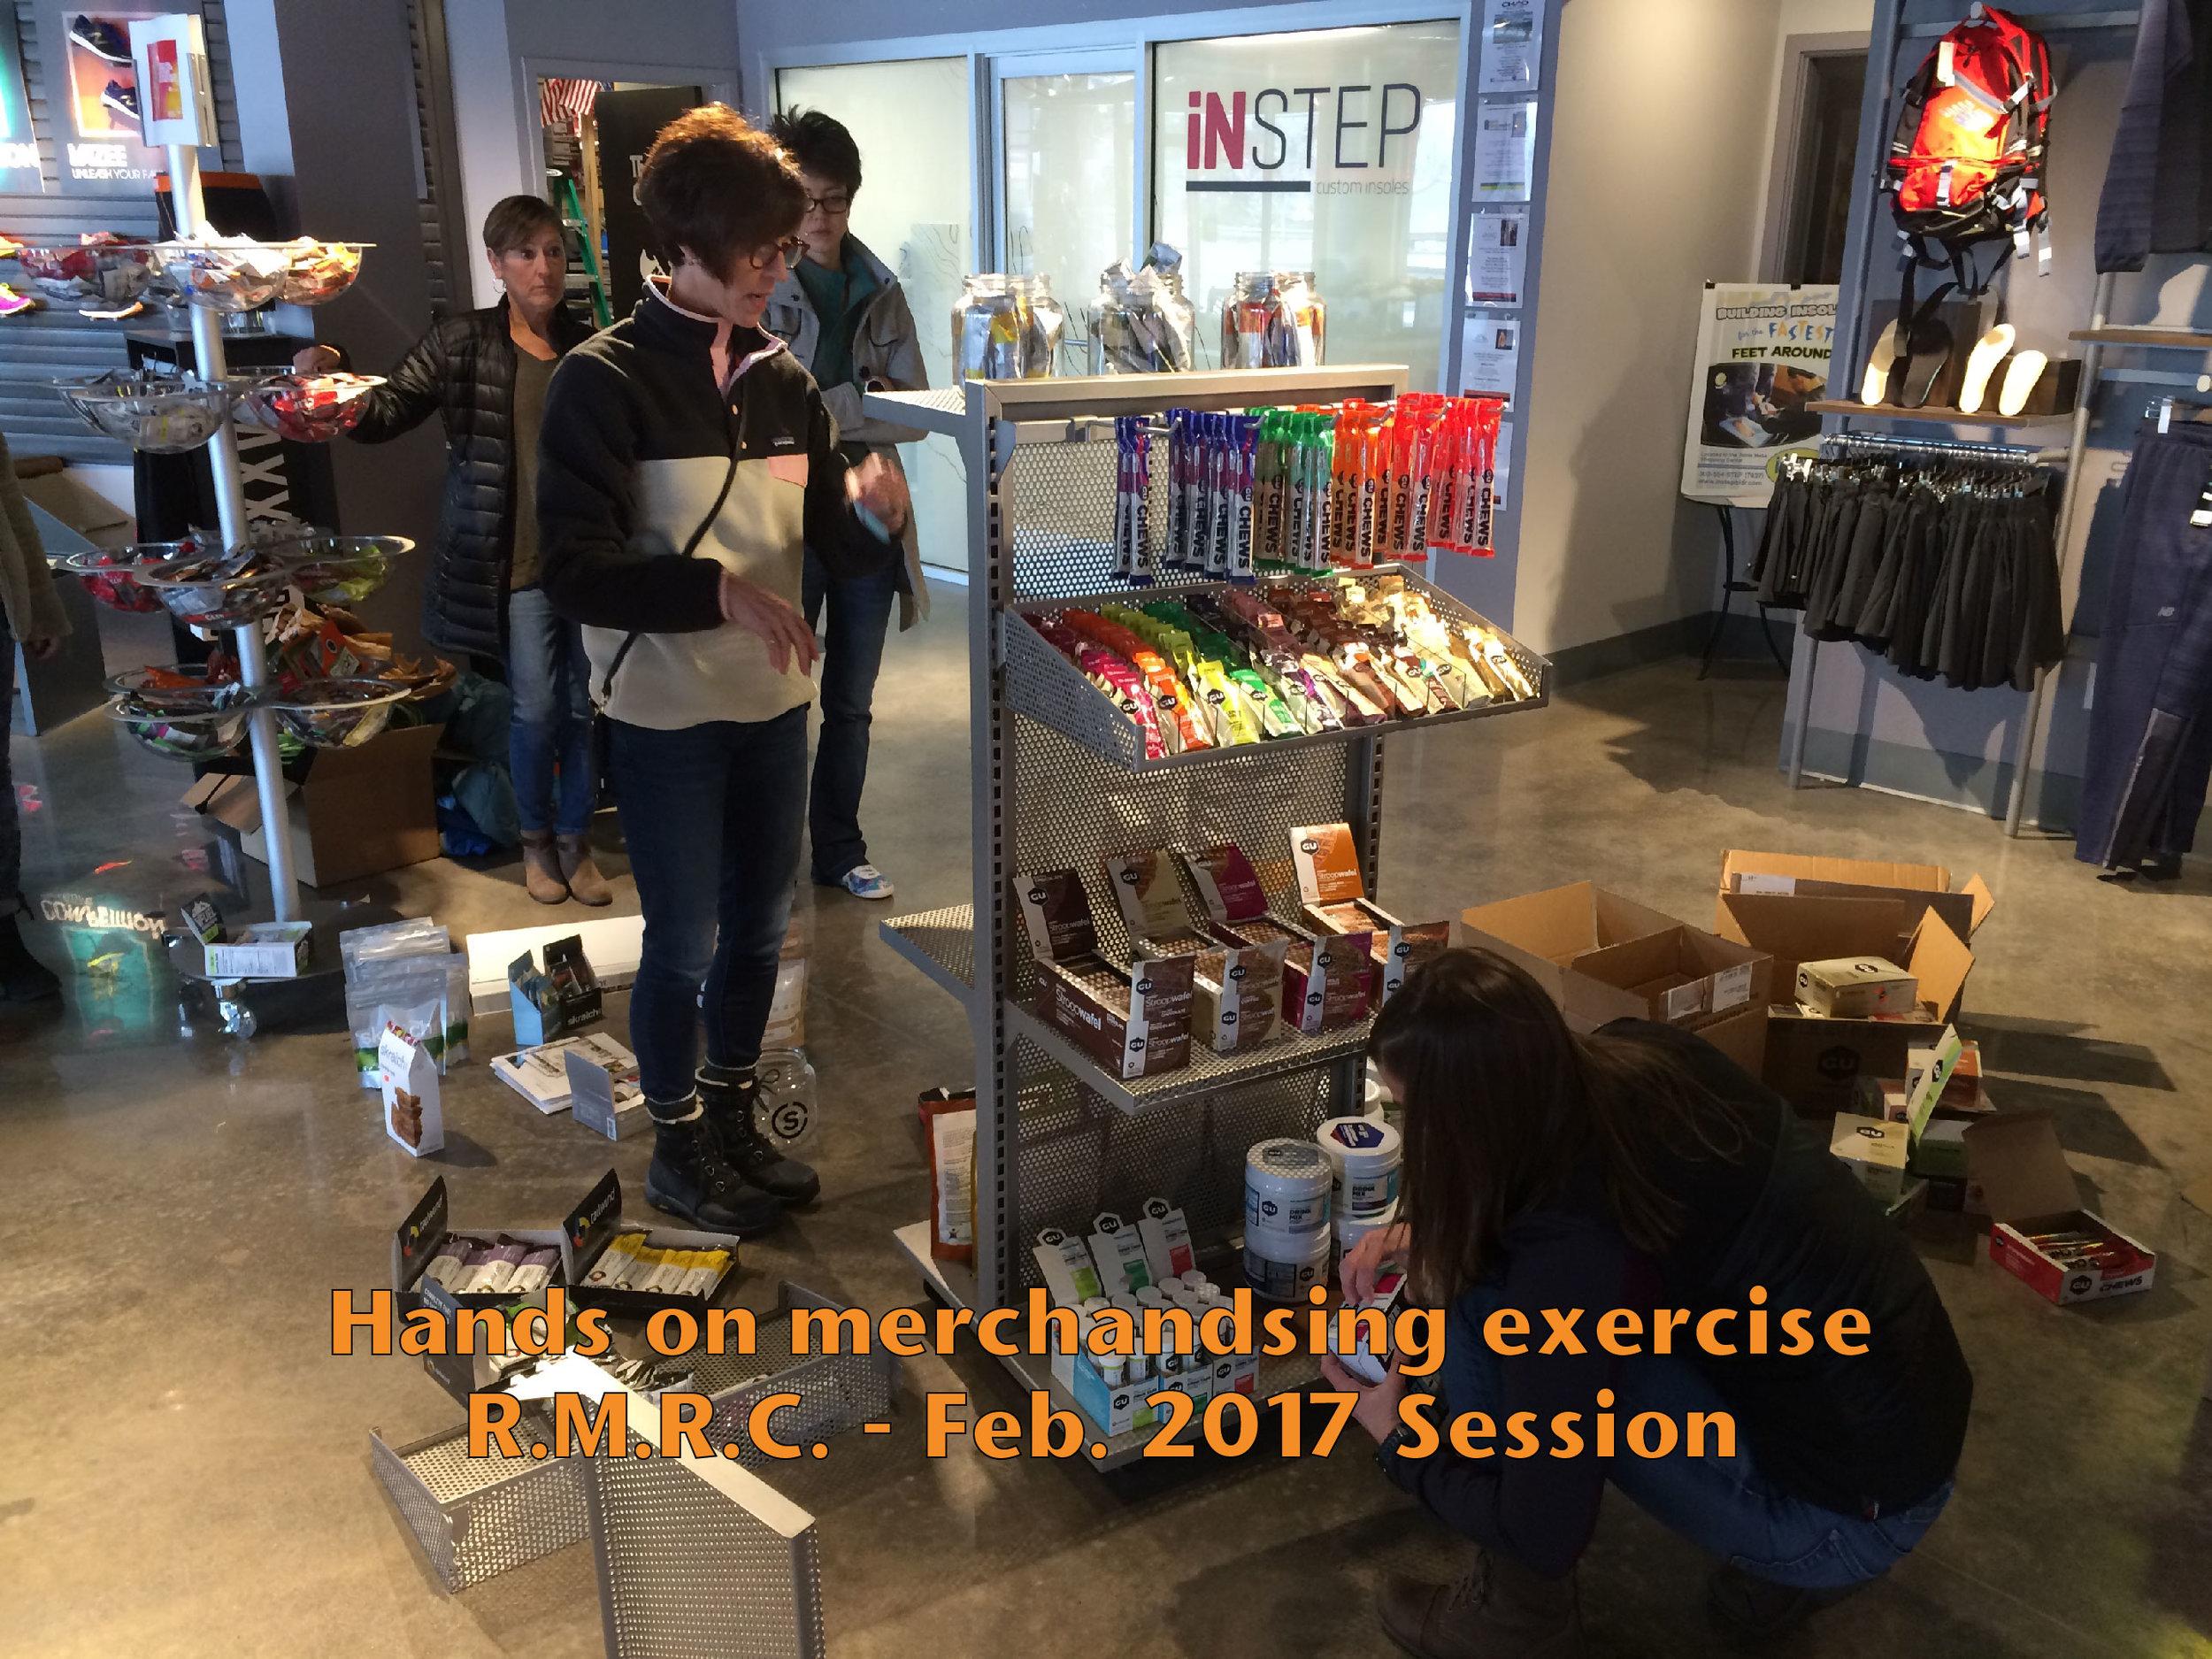 Hands On Merchandising Exercise.jpg